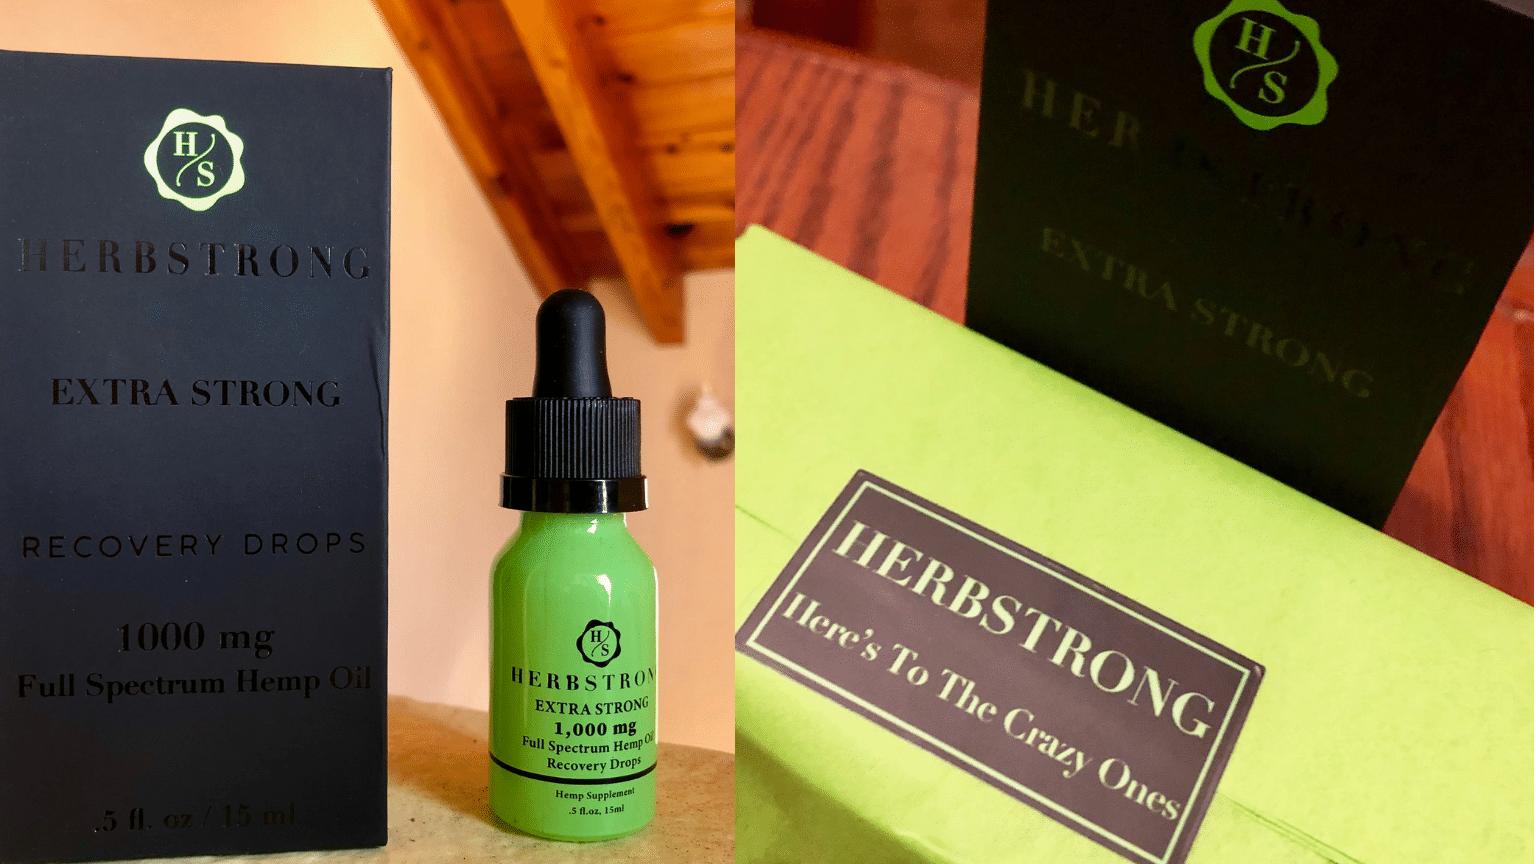 herbstrong-cbd-oil-drops